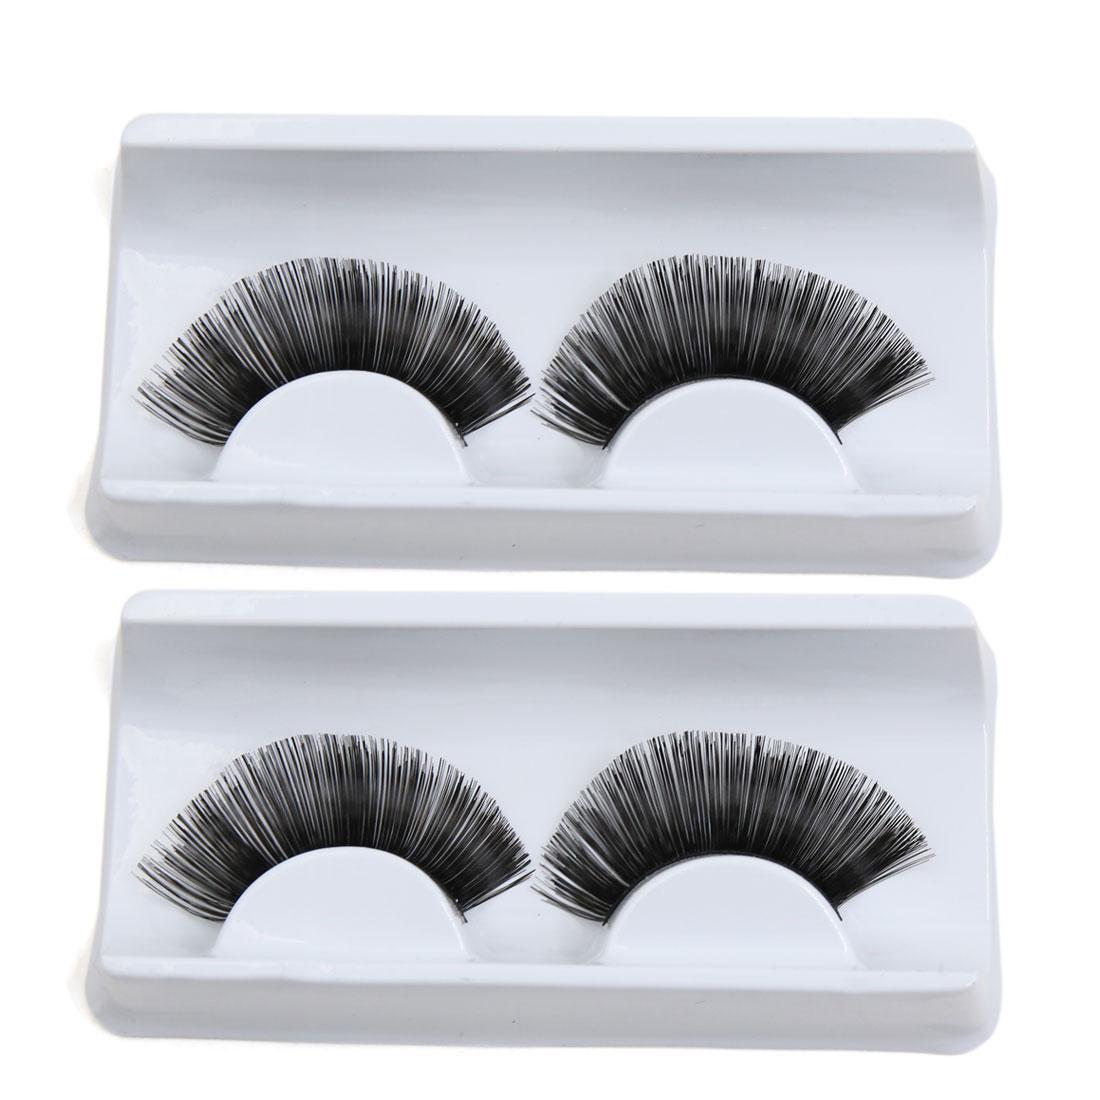 2 Pairs Black Decor False Eyelashes Eyes Styling Makeup Cosmetic for Party Club